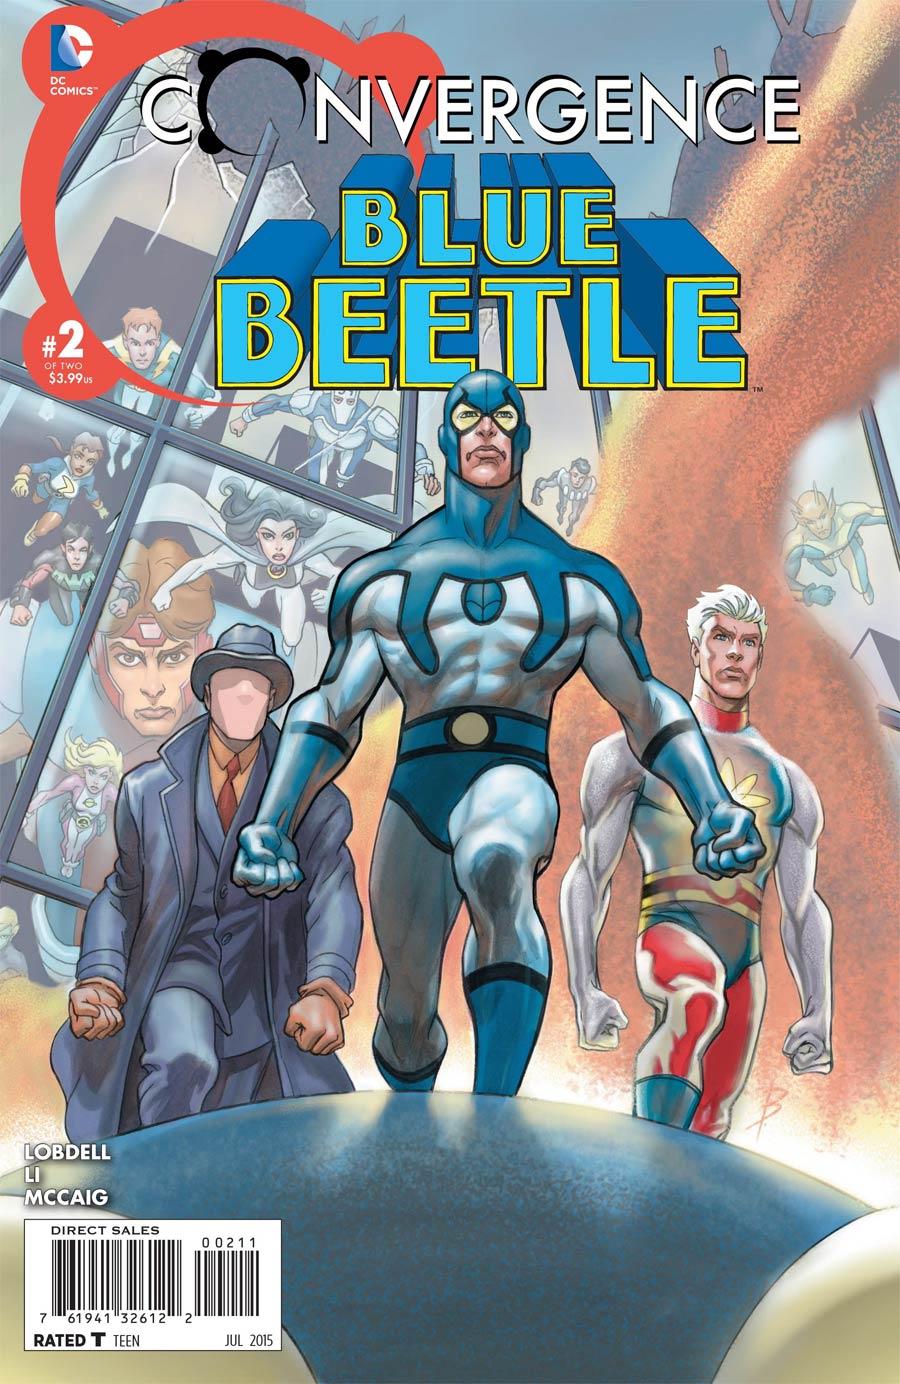 Convergence Blue Beetle #2 Cover A Regular Bret Blevins Cover